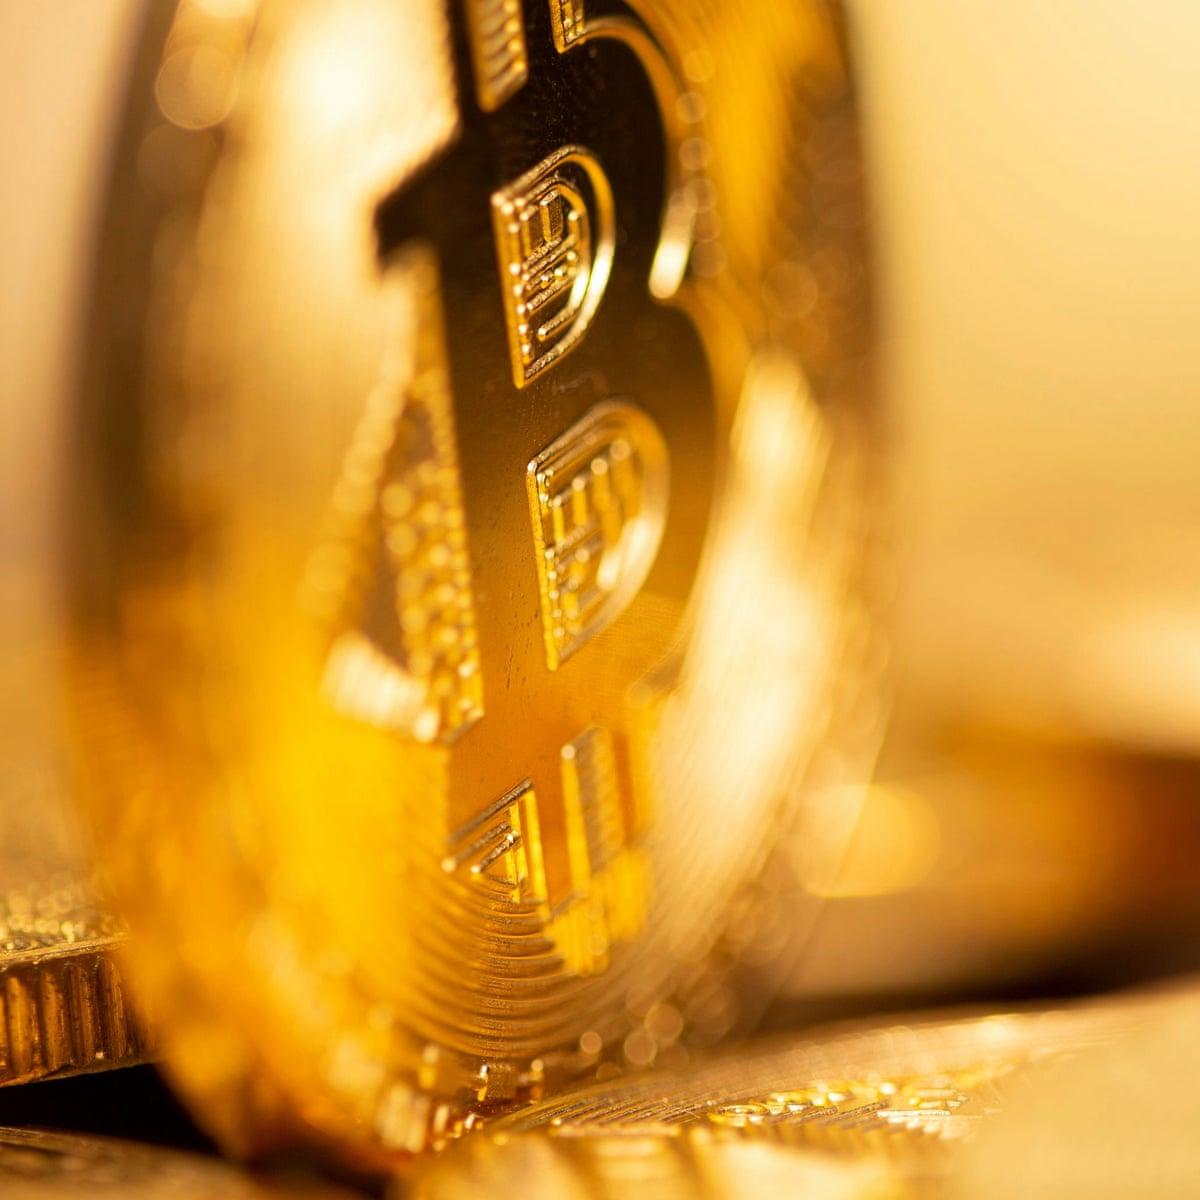 Europos centrinio banko vykdomoji valdyba narys prieš Bitcoin